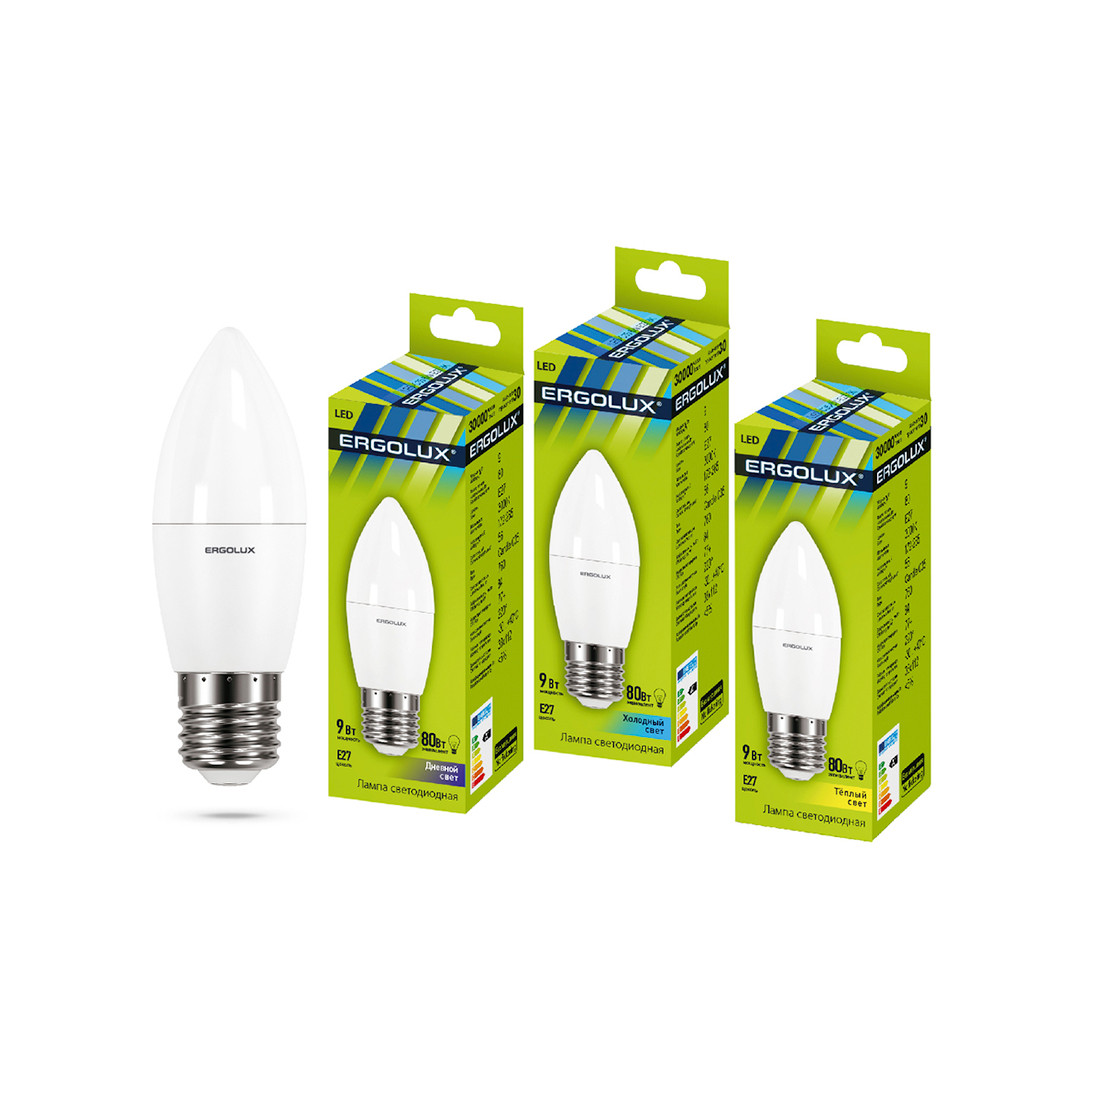 Эл. лампа светодиодная Ergolux C35/3000K/E27/9Вт, Тёплый